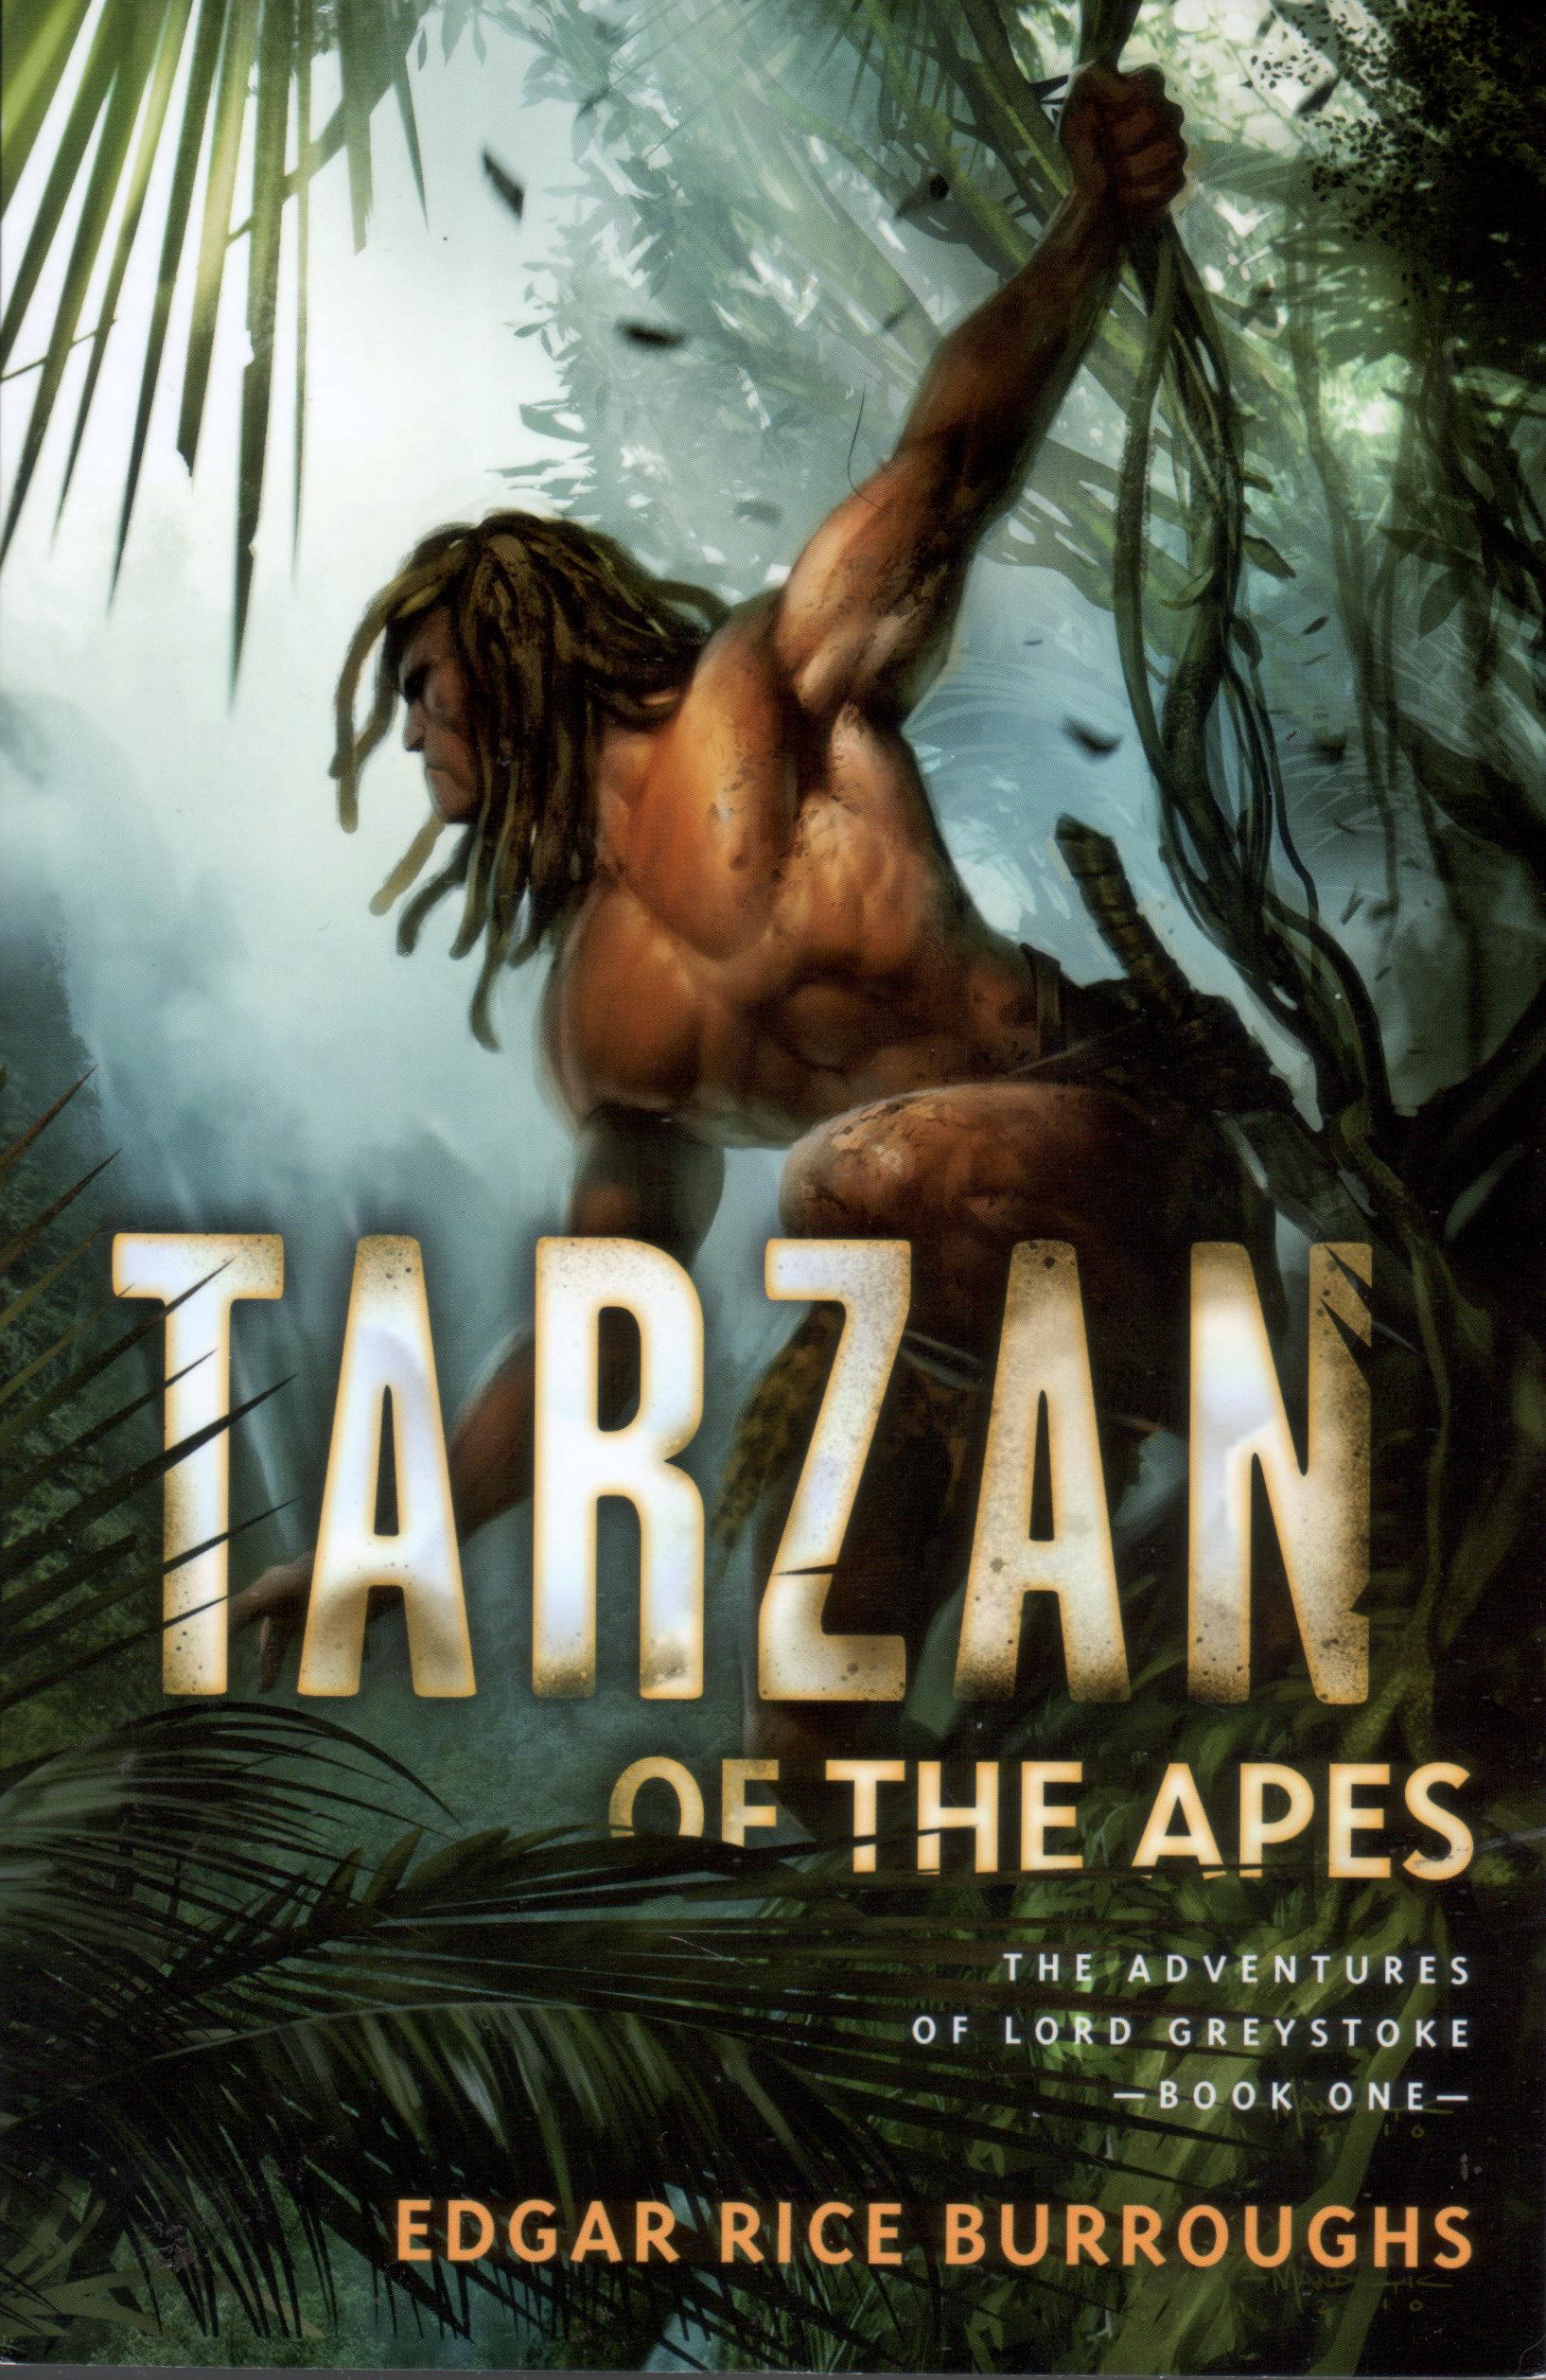 br/>In Paperback: Tarzan of the Apes — Steve Donoghue